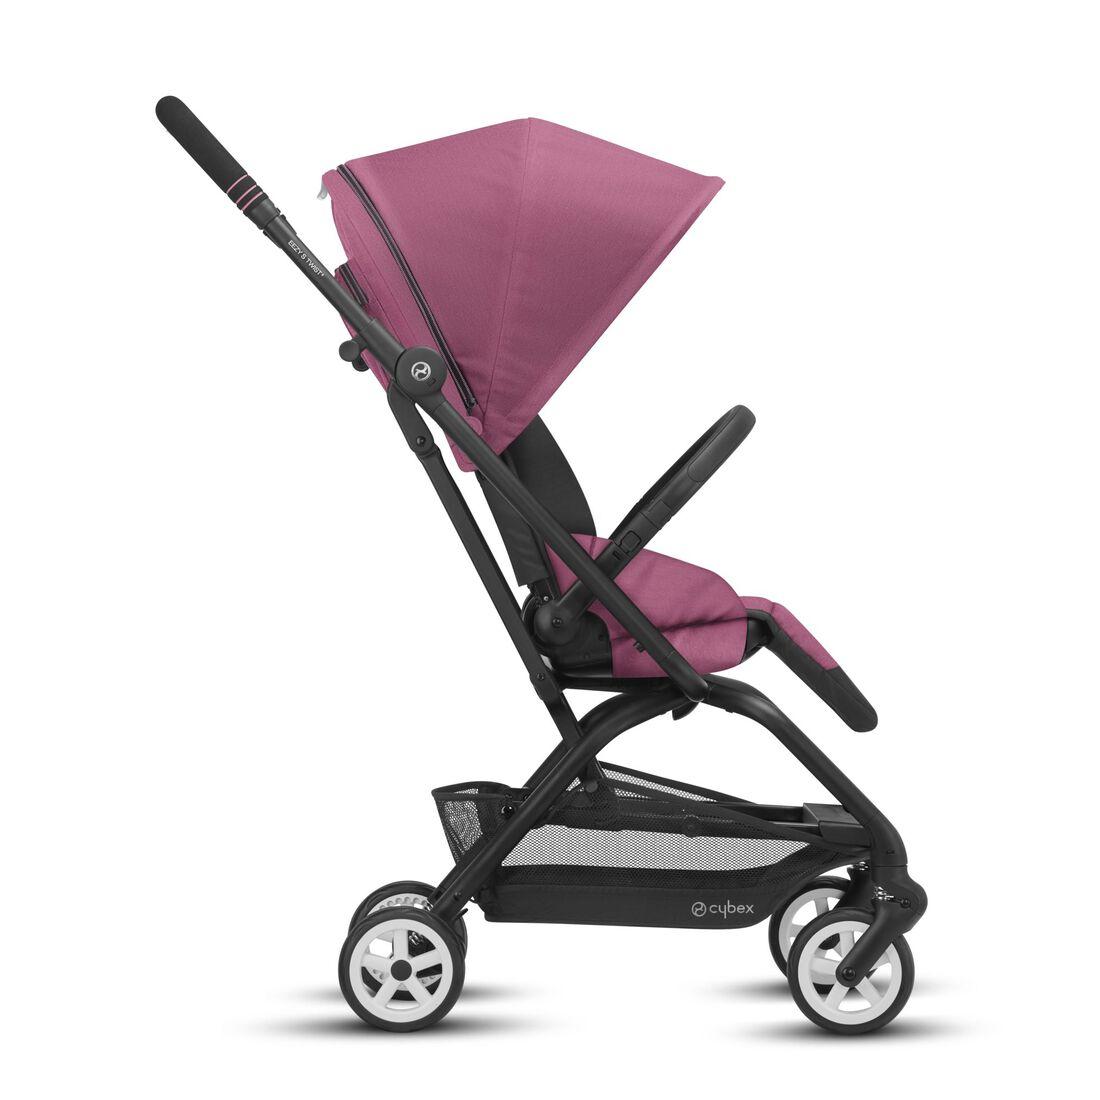 CYBEX Eezy S Twist 2 - Magnolia Pink (Schwarzer Rahmen) in Magnolia Pink (Black Frame) large Bild 2